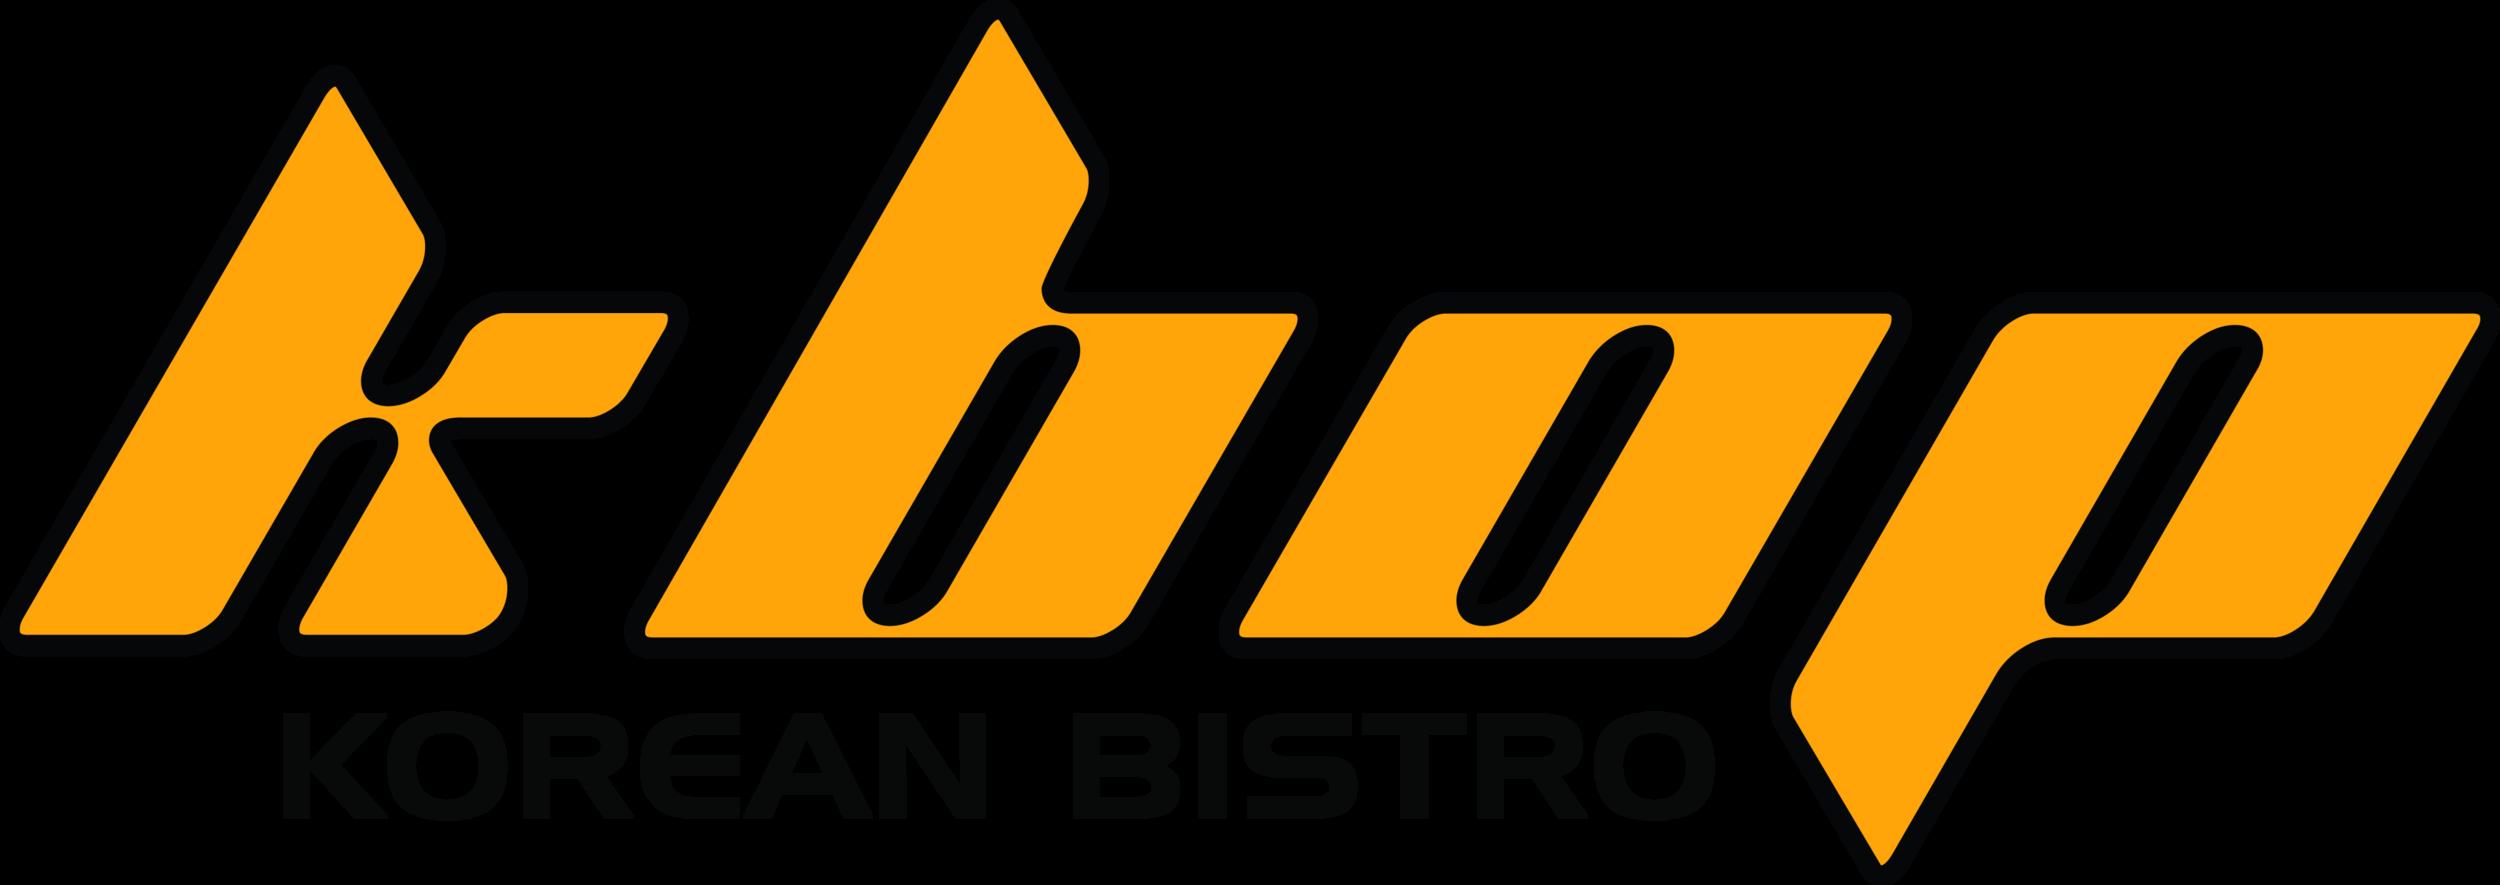 K-Bop-logo.png